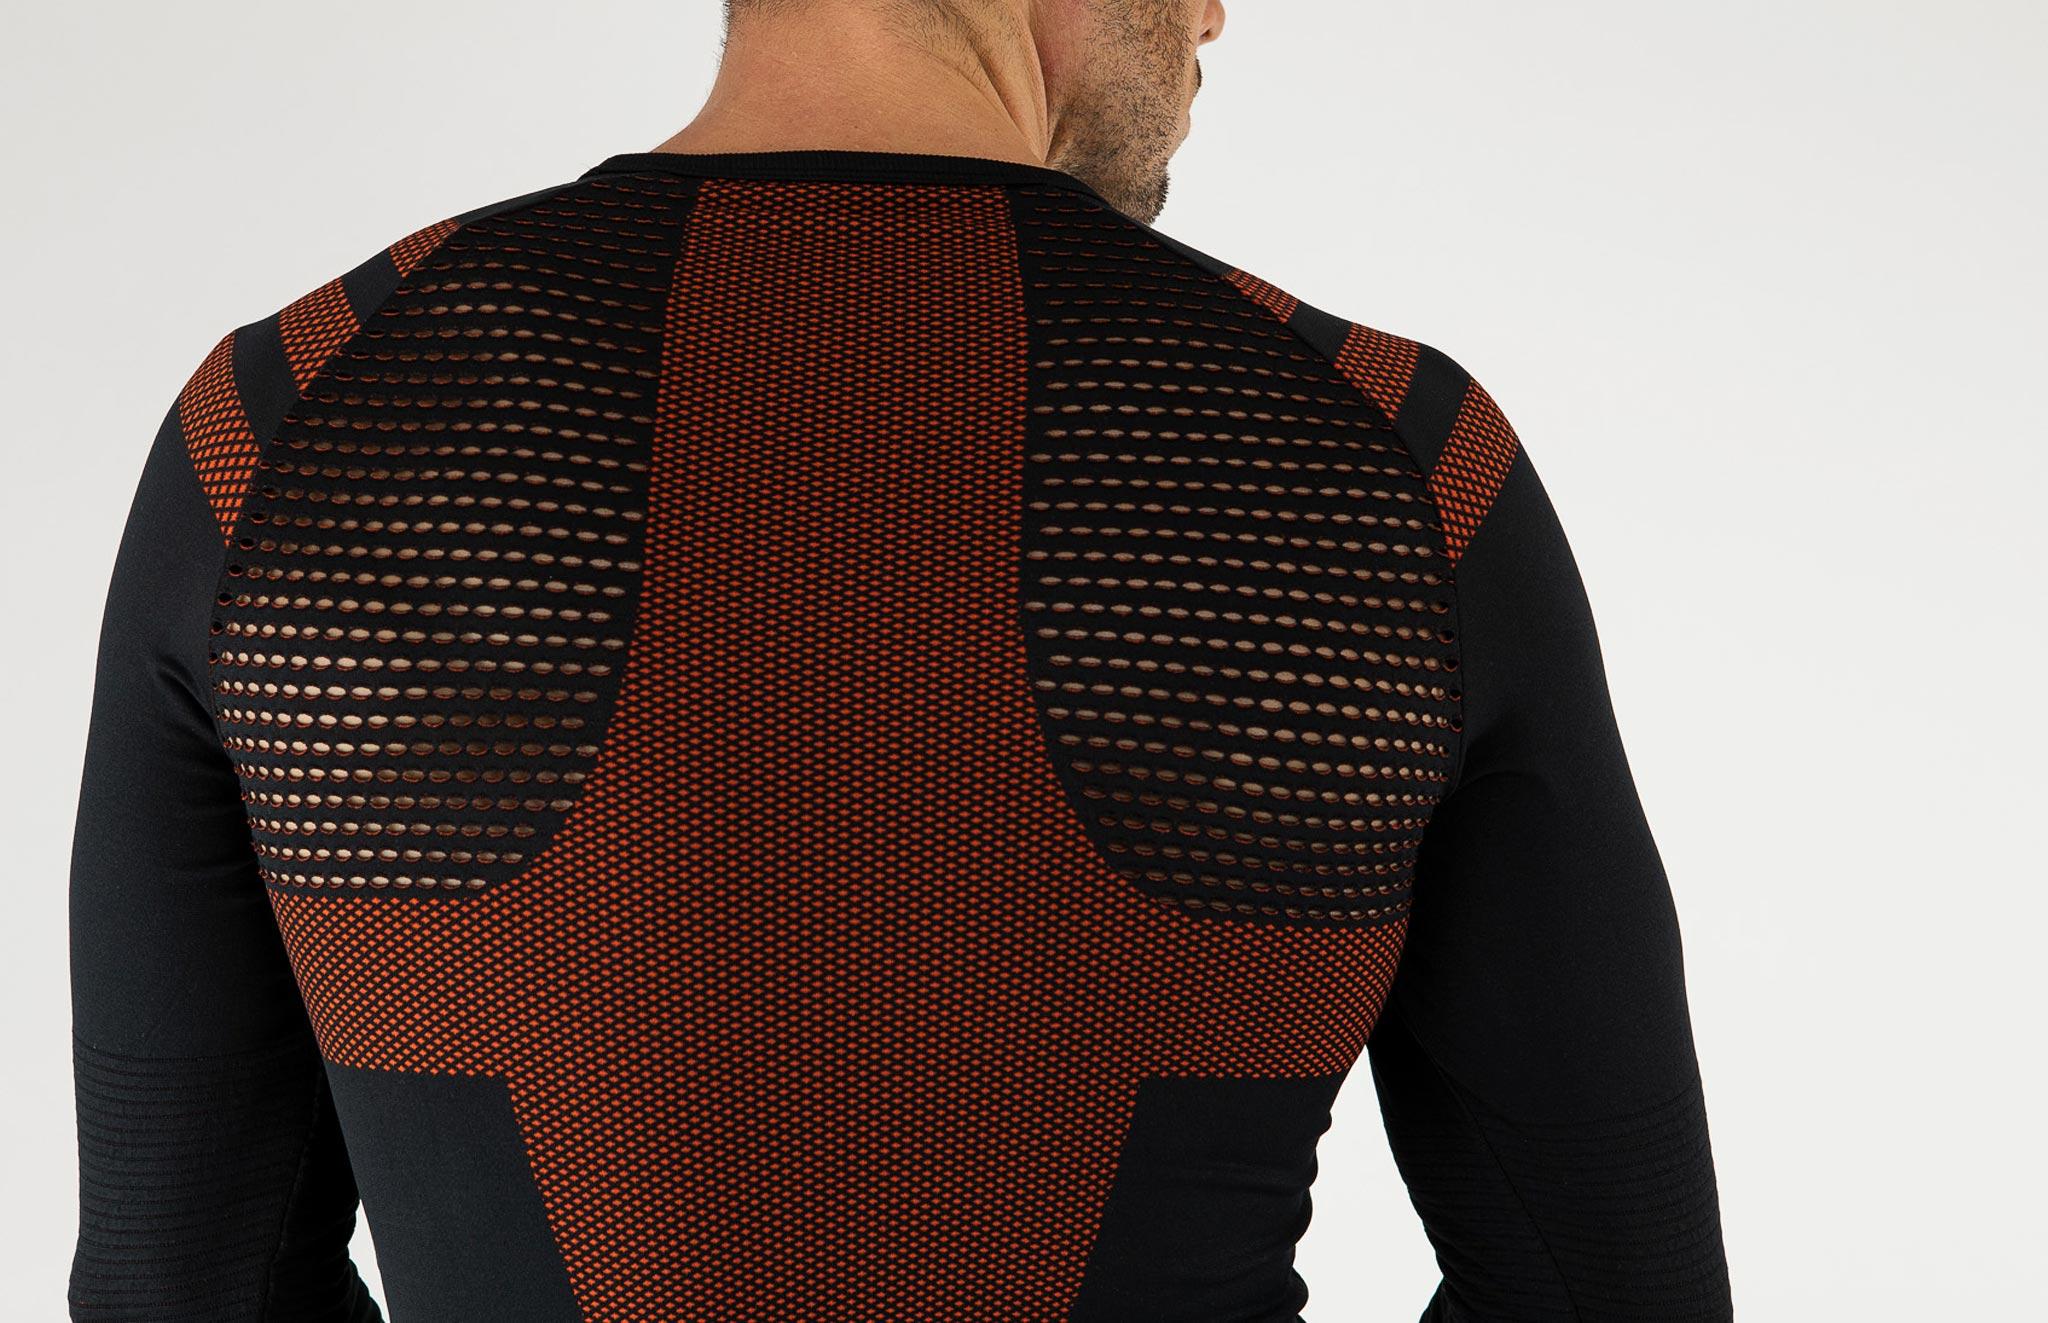 Premium seamless apparel from THRONE